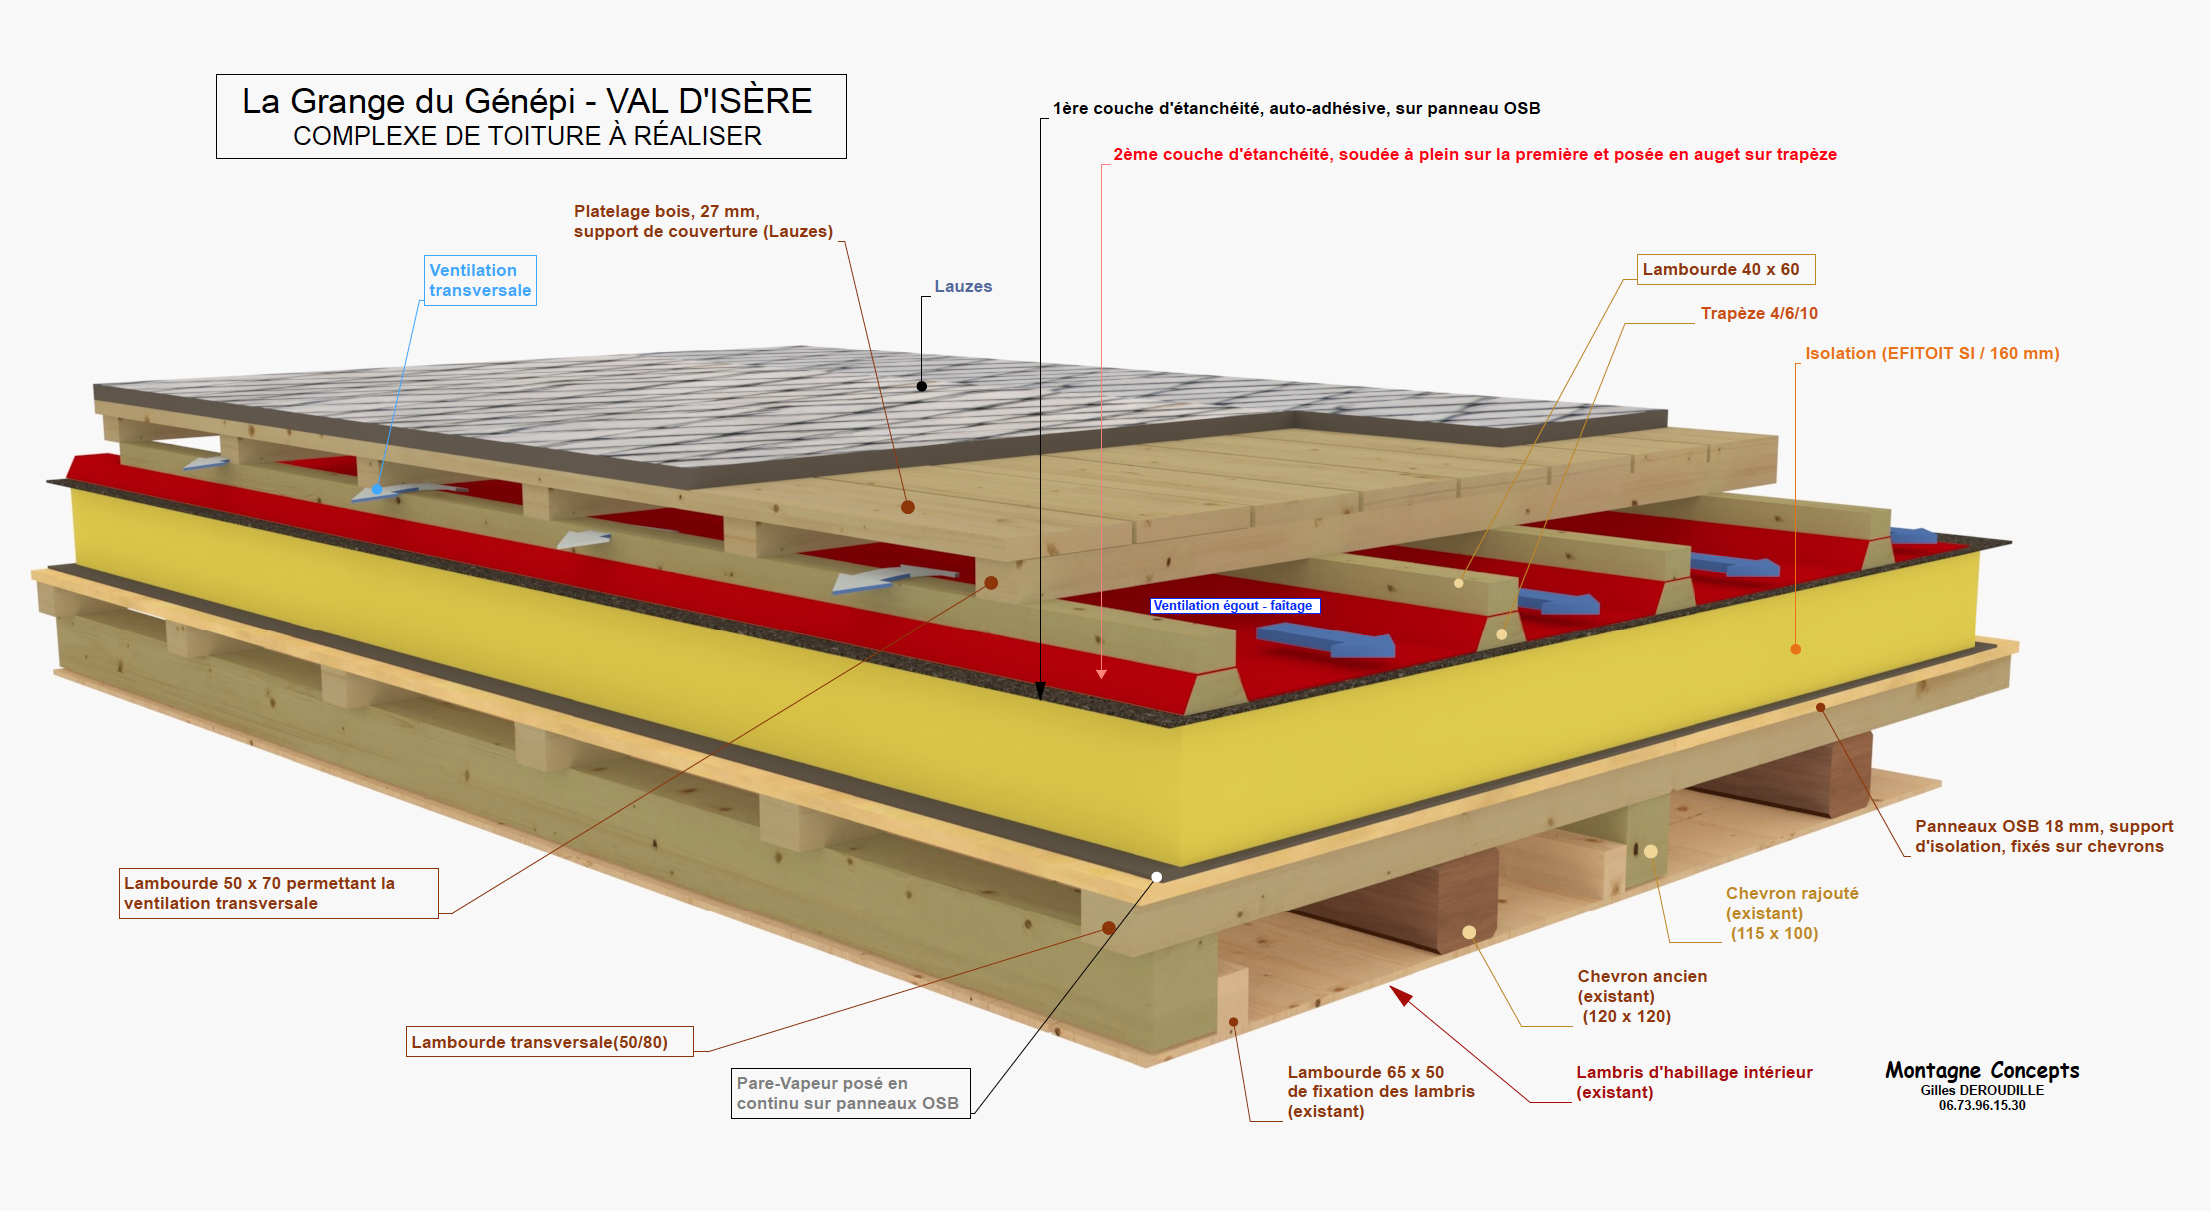 Complexe de toiture 3D